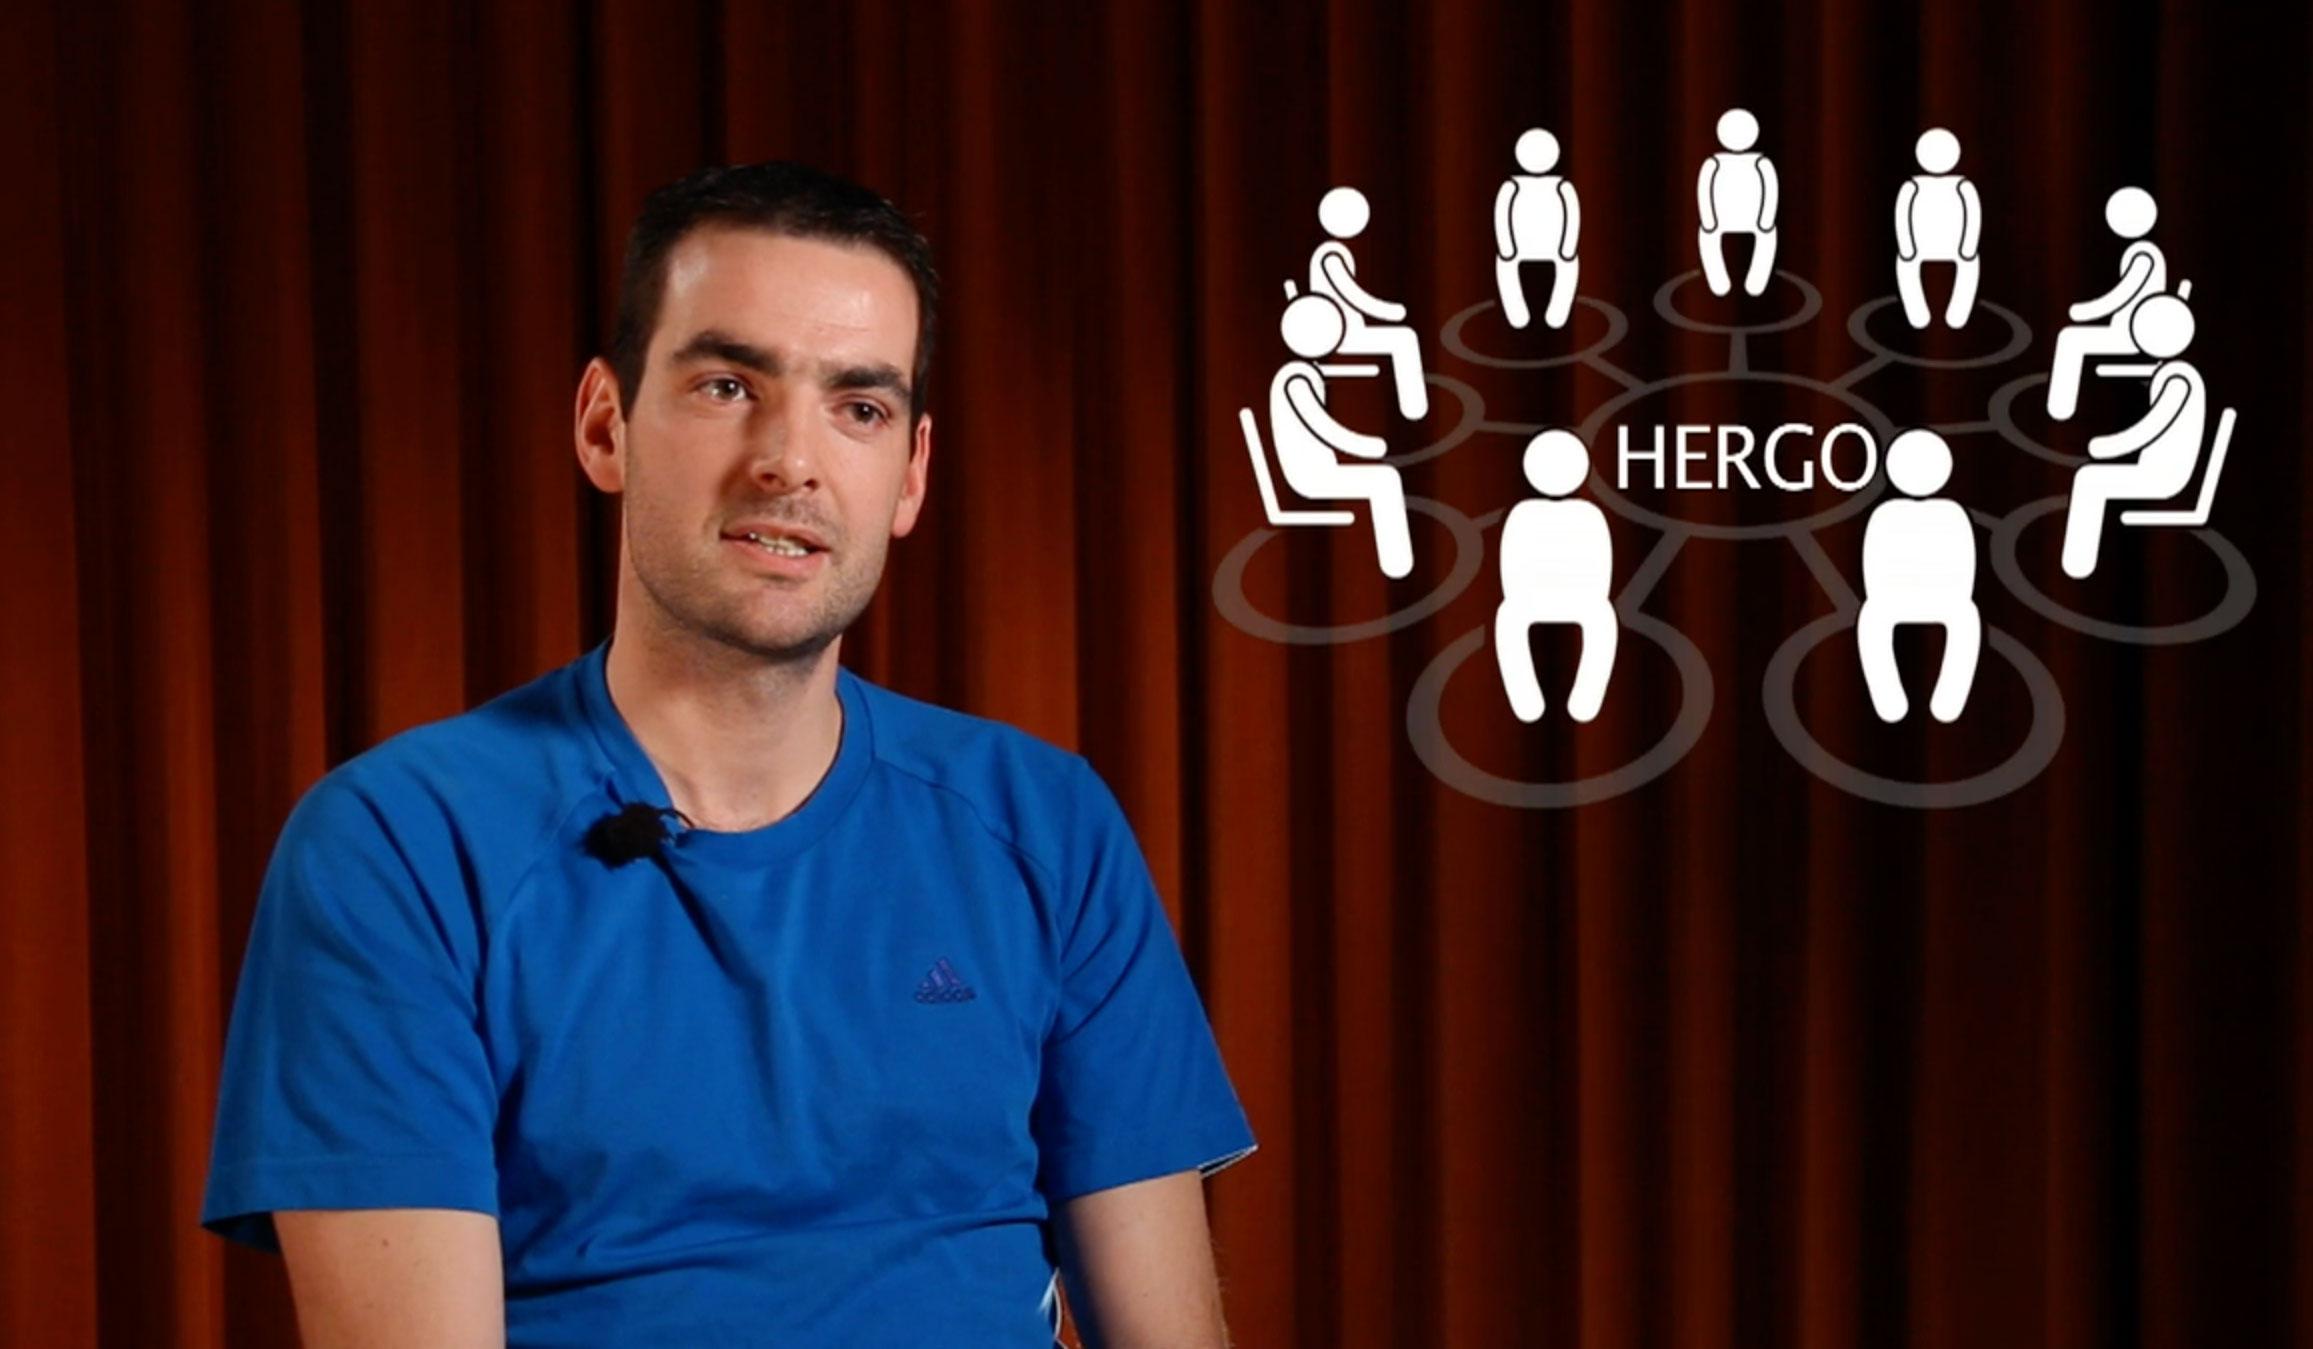 Hergo_web